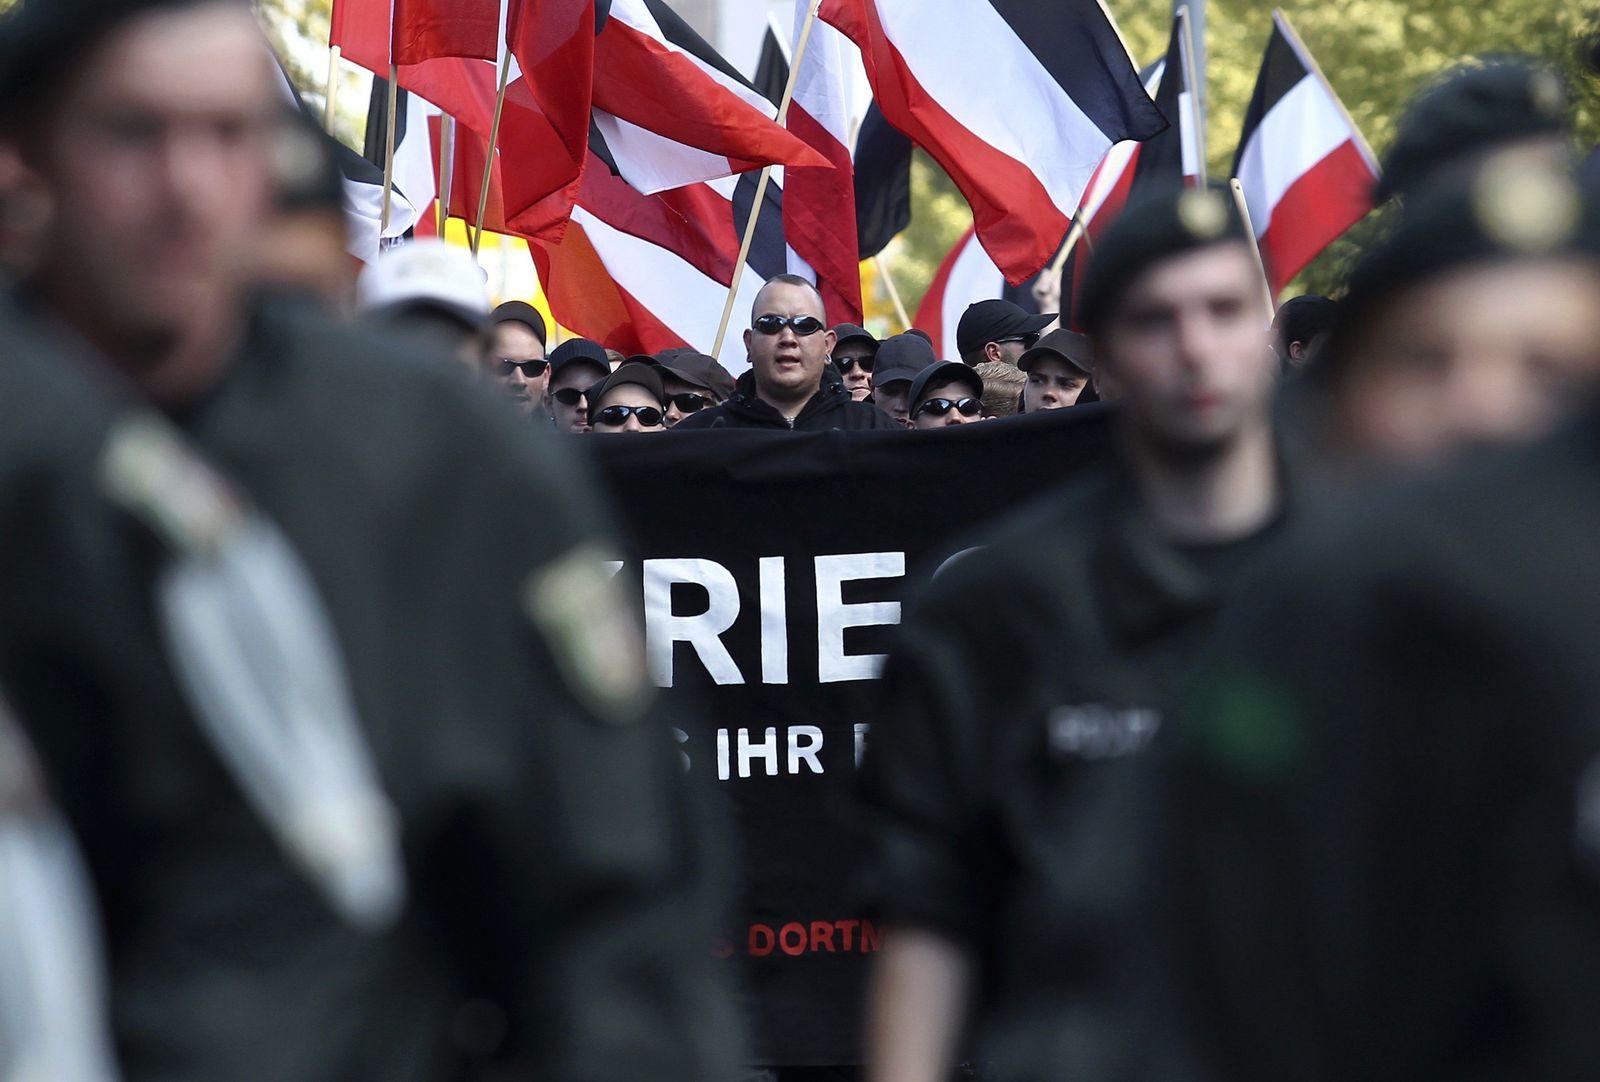 Dortmund / Neonazis / Proteste XXL